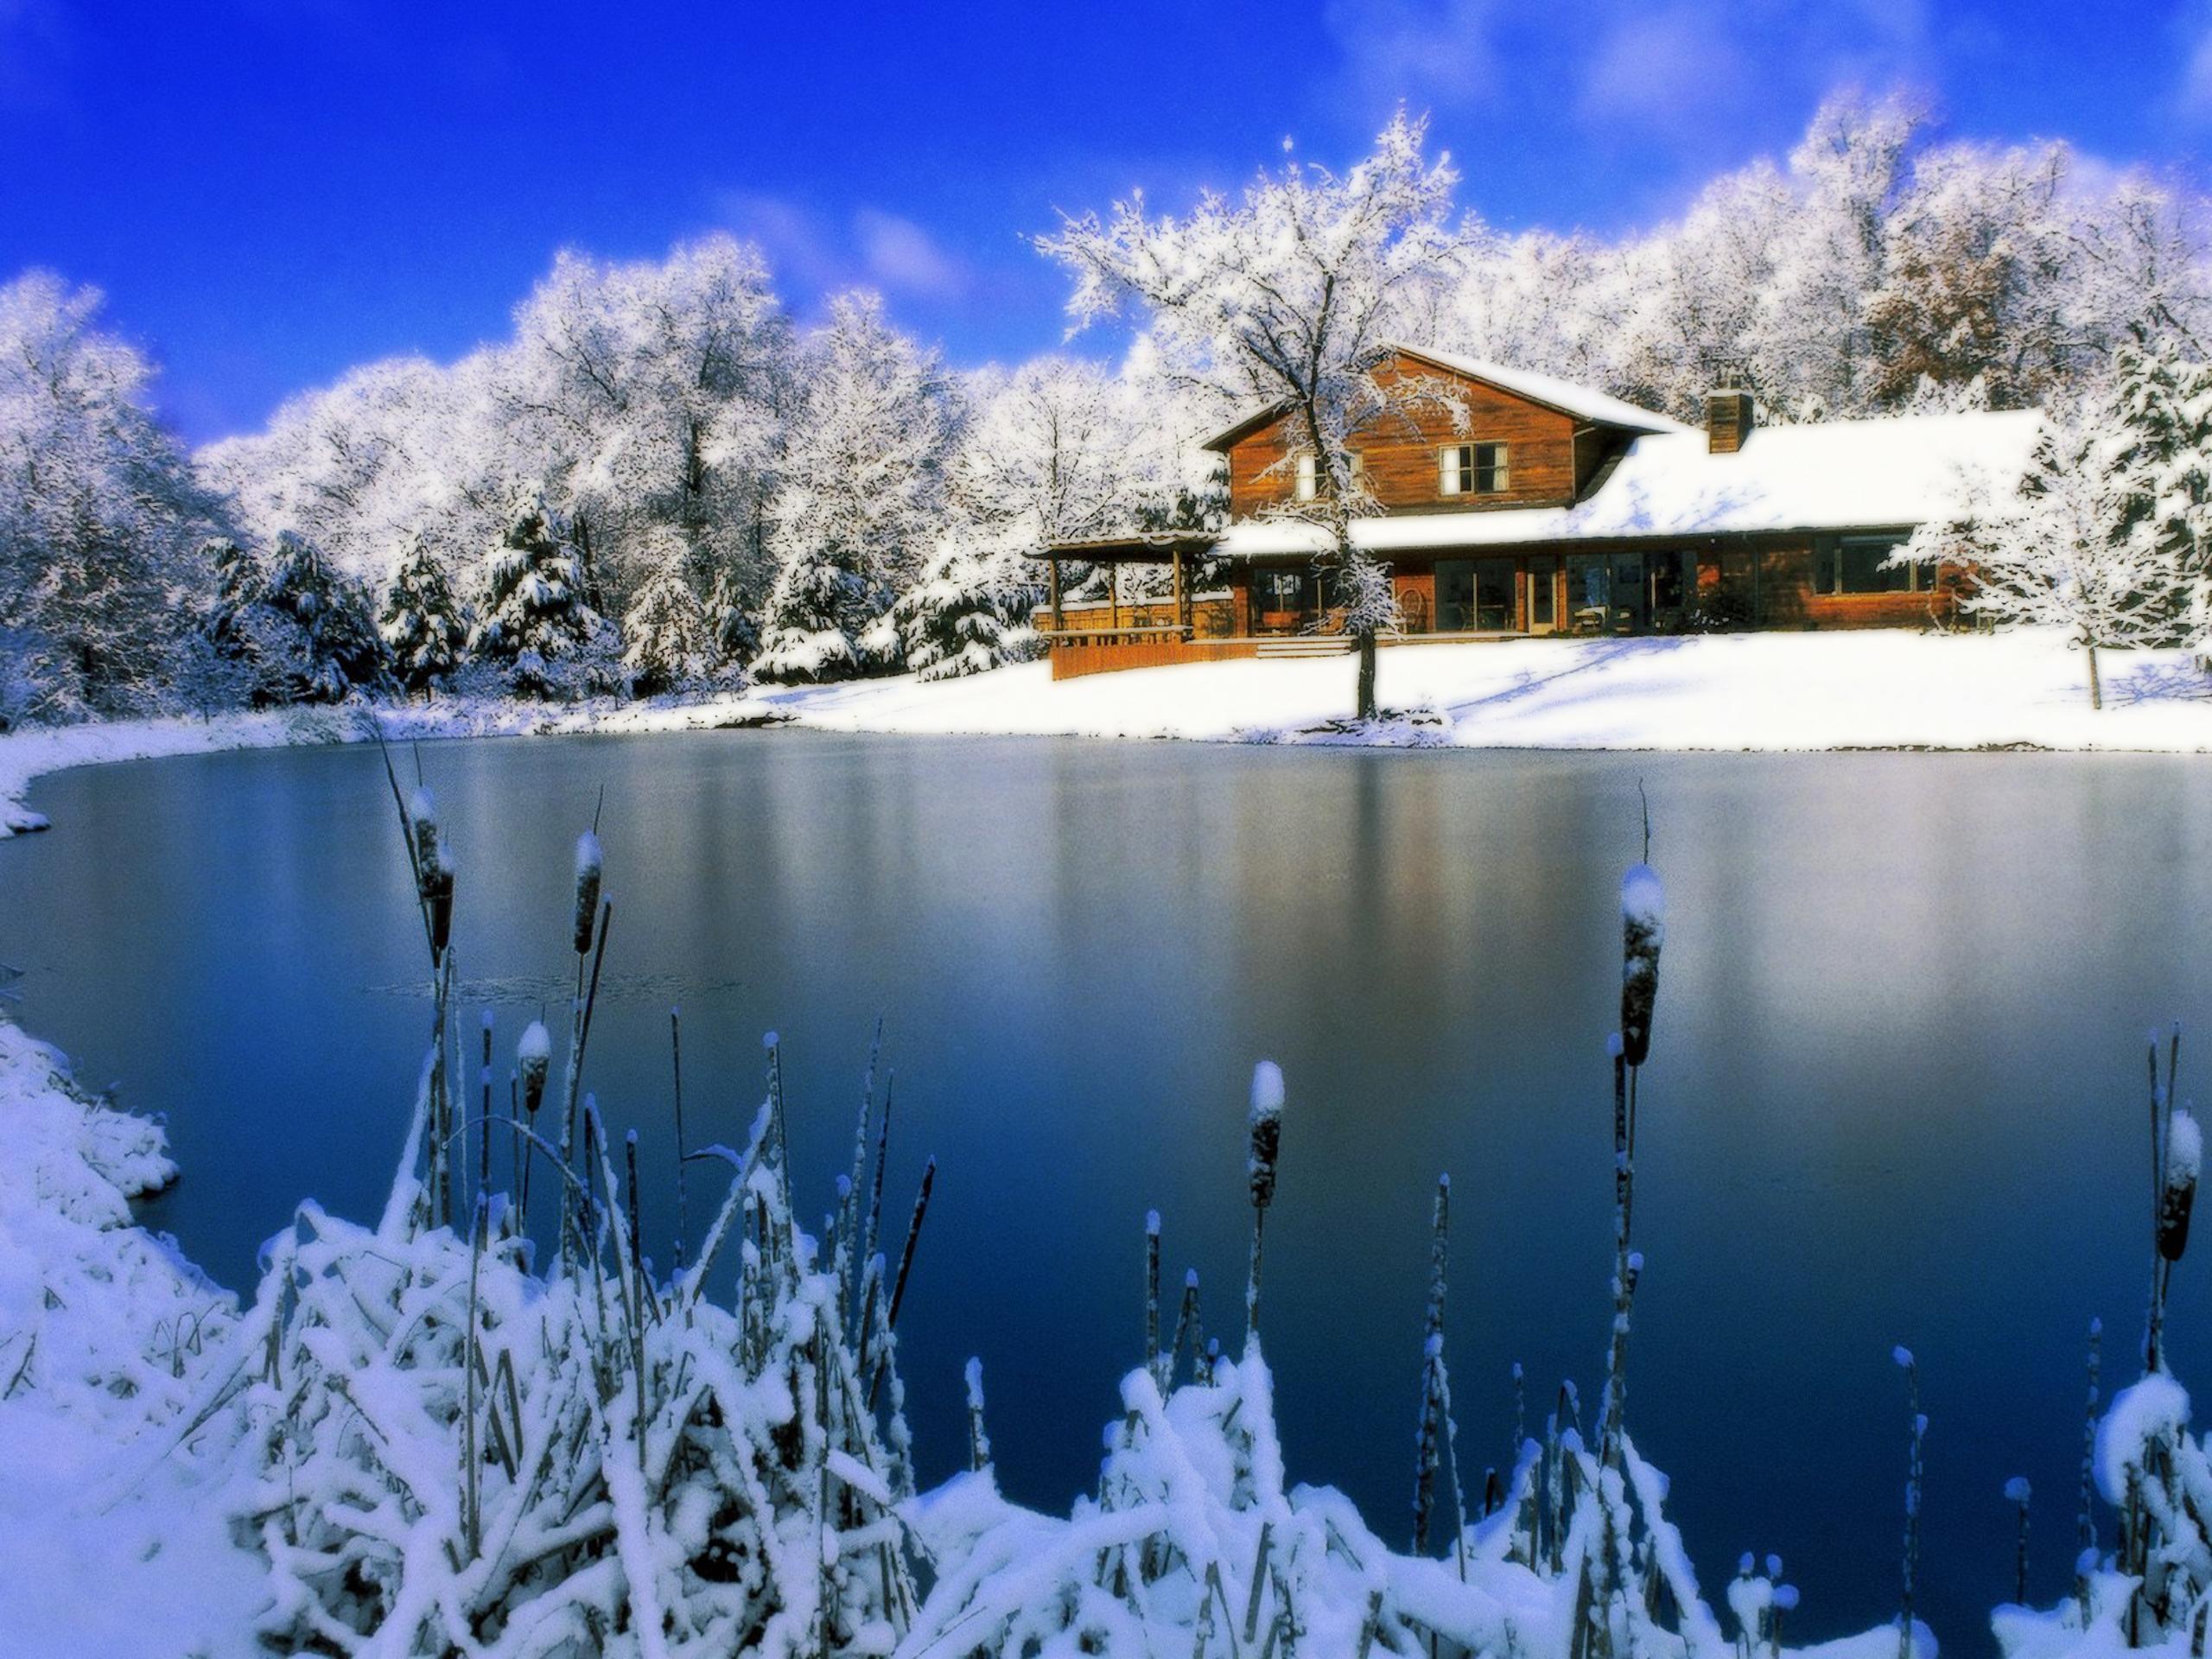 winter scenes viewing gallery